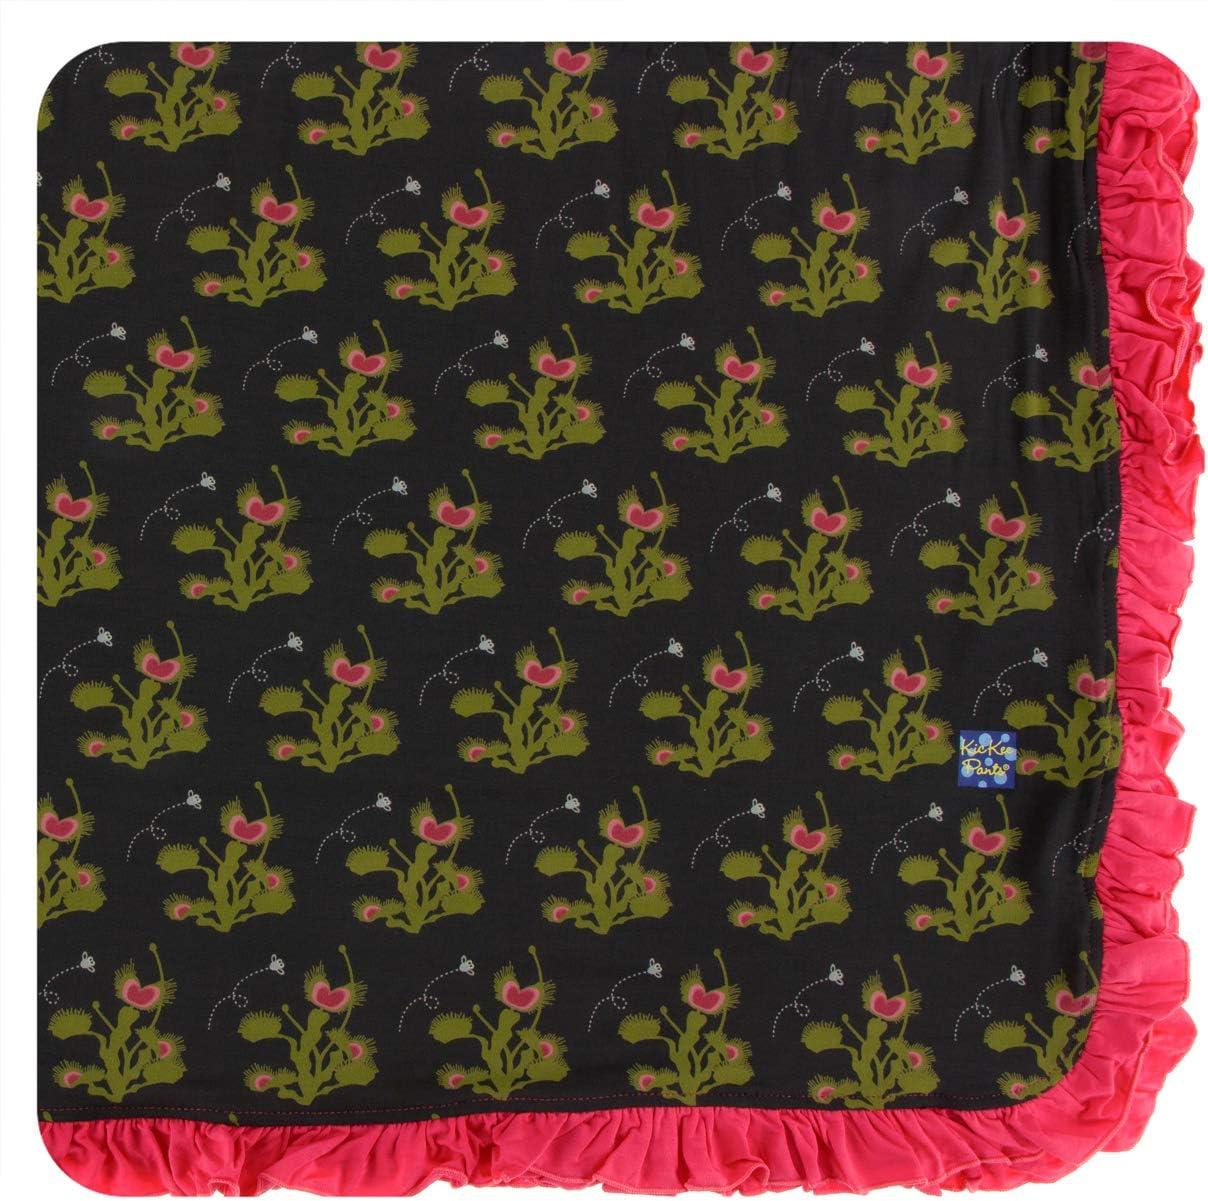 KicKee Pants Print Fees free!! favorite Ruffle Toddler Blanket Venus Size One Zebra